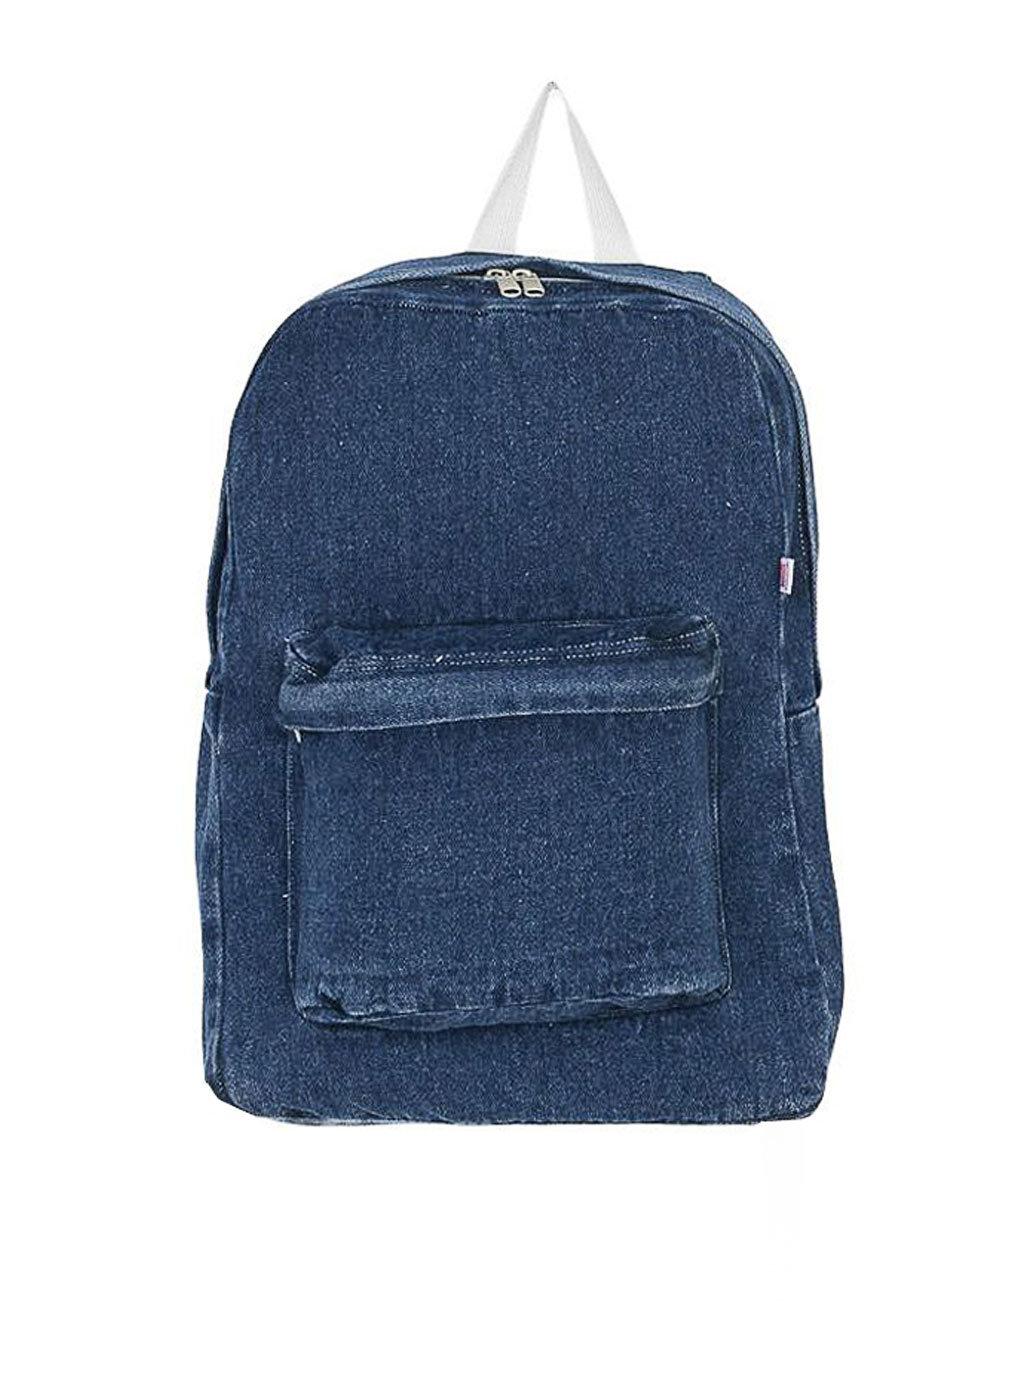 Denim School Bag   American Apparel